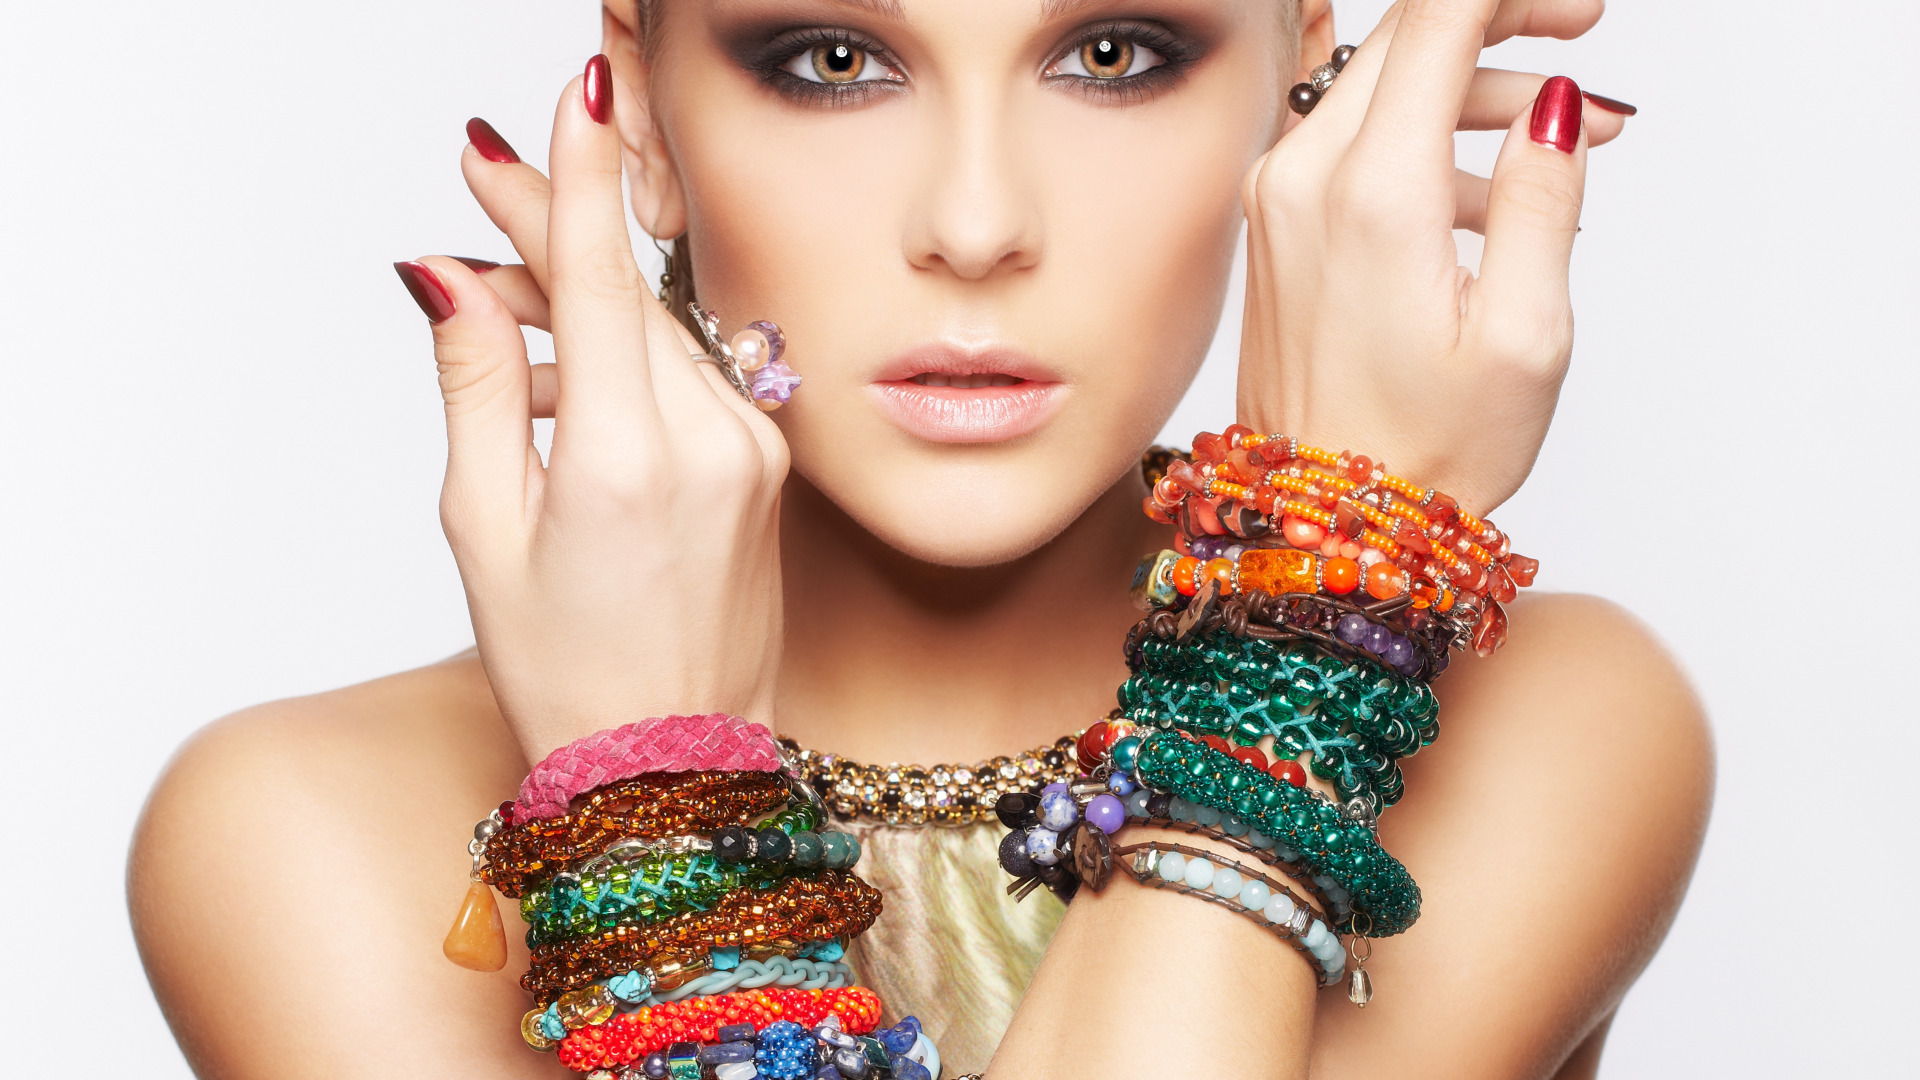 Фото девушки с браслетами